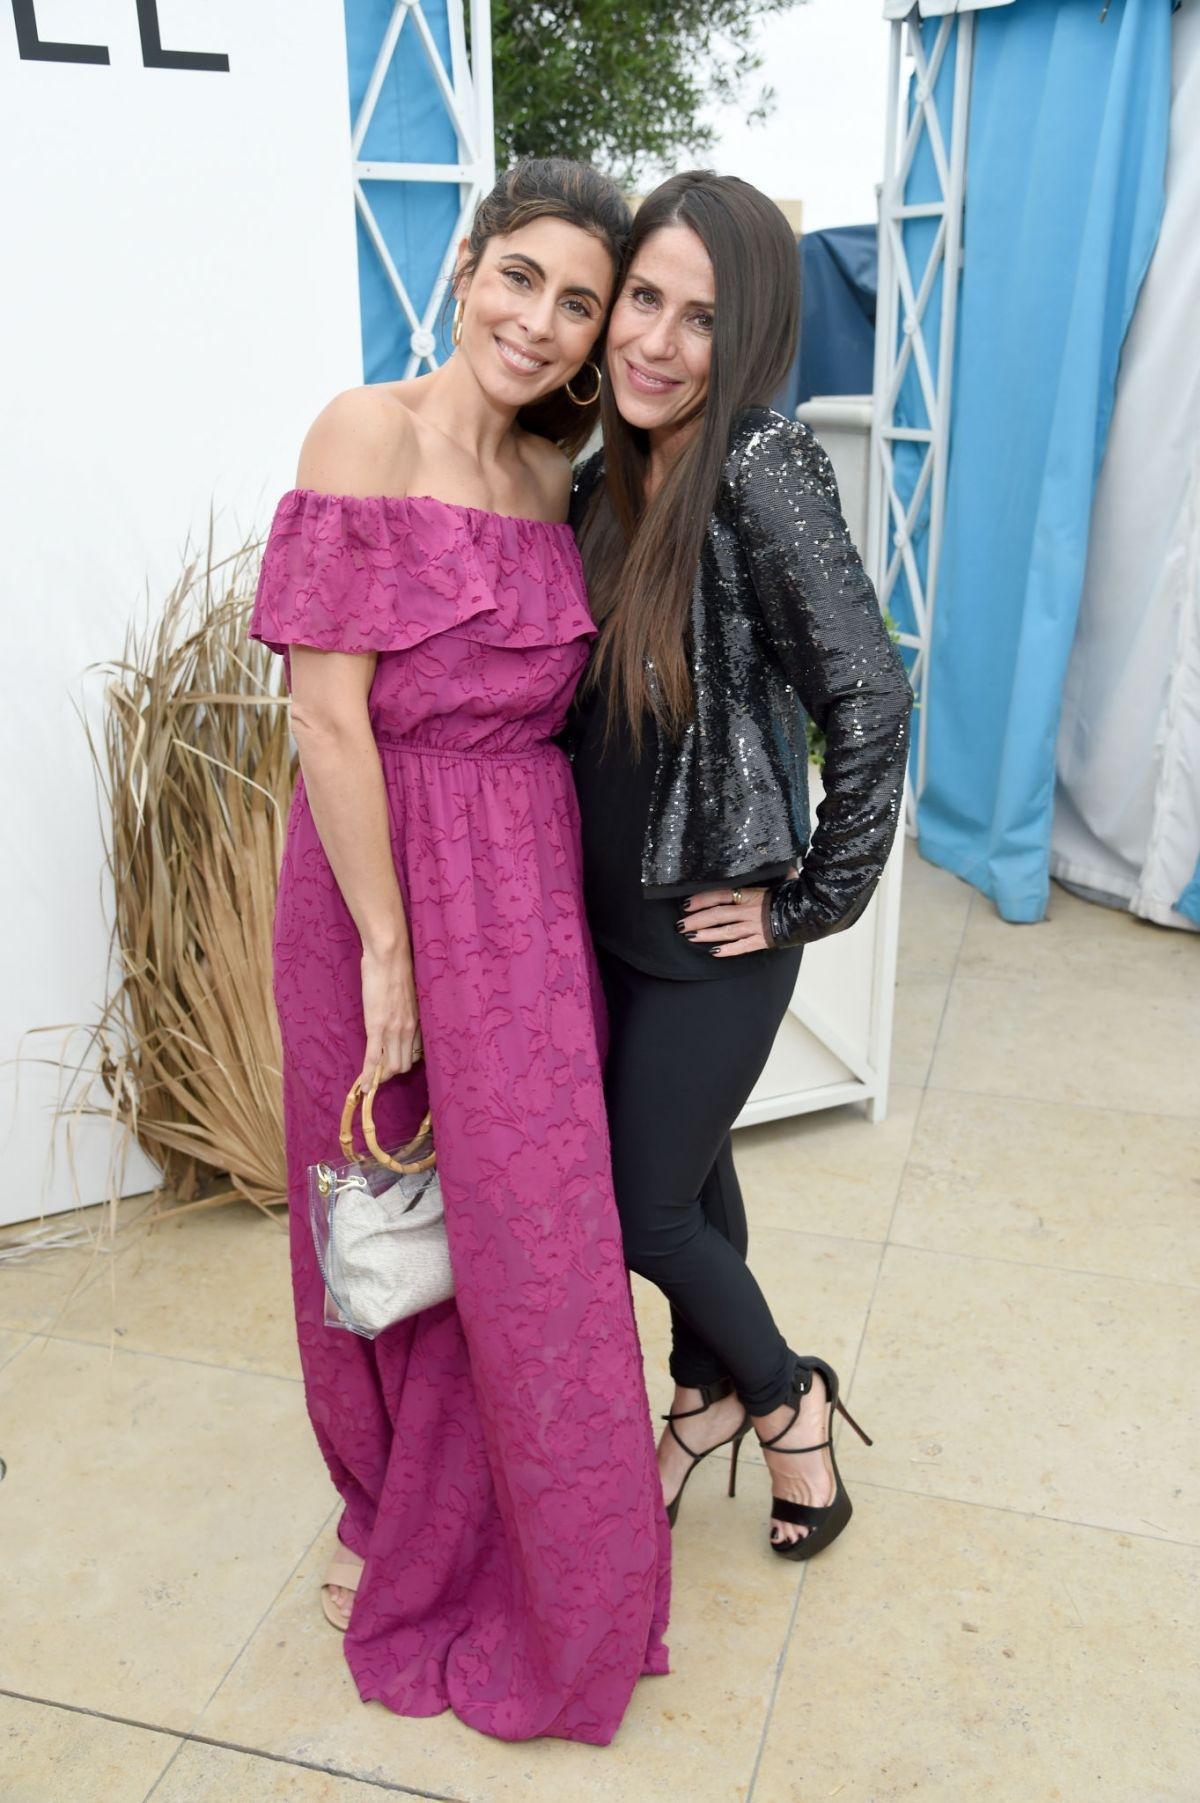 SOLEIL MOON FRYE at Summer 2019 Box of Style by Rachel Zoe ...